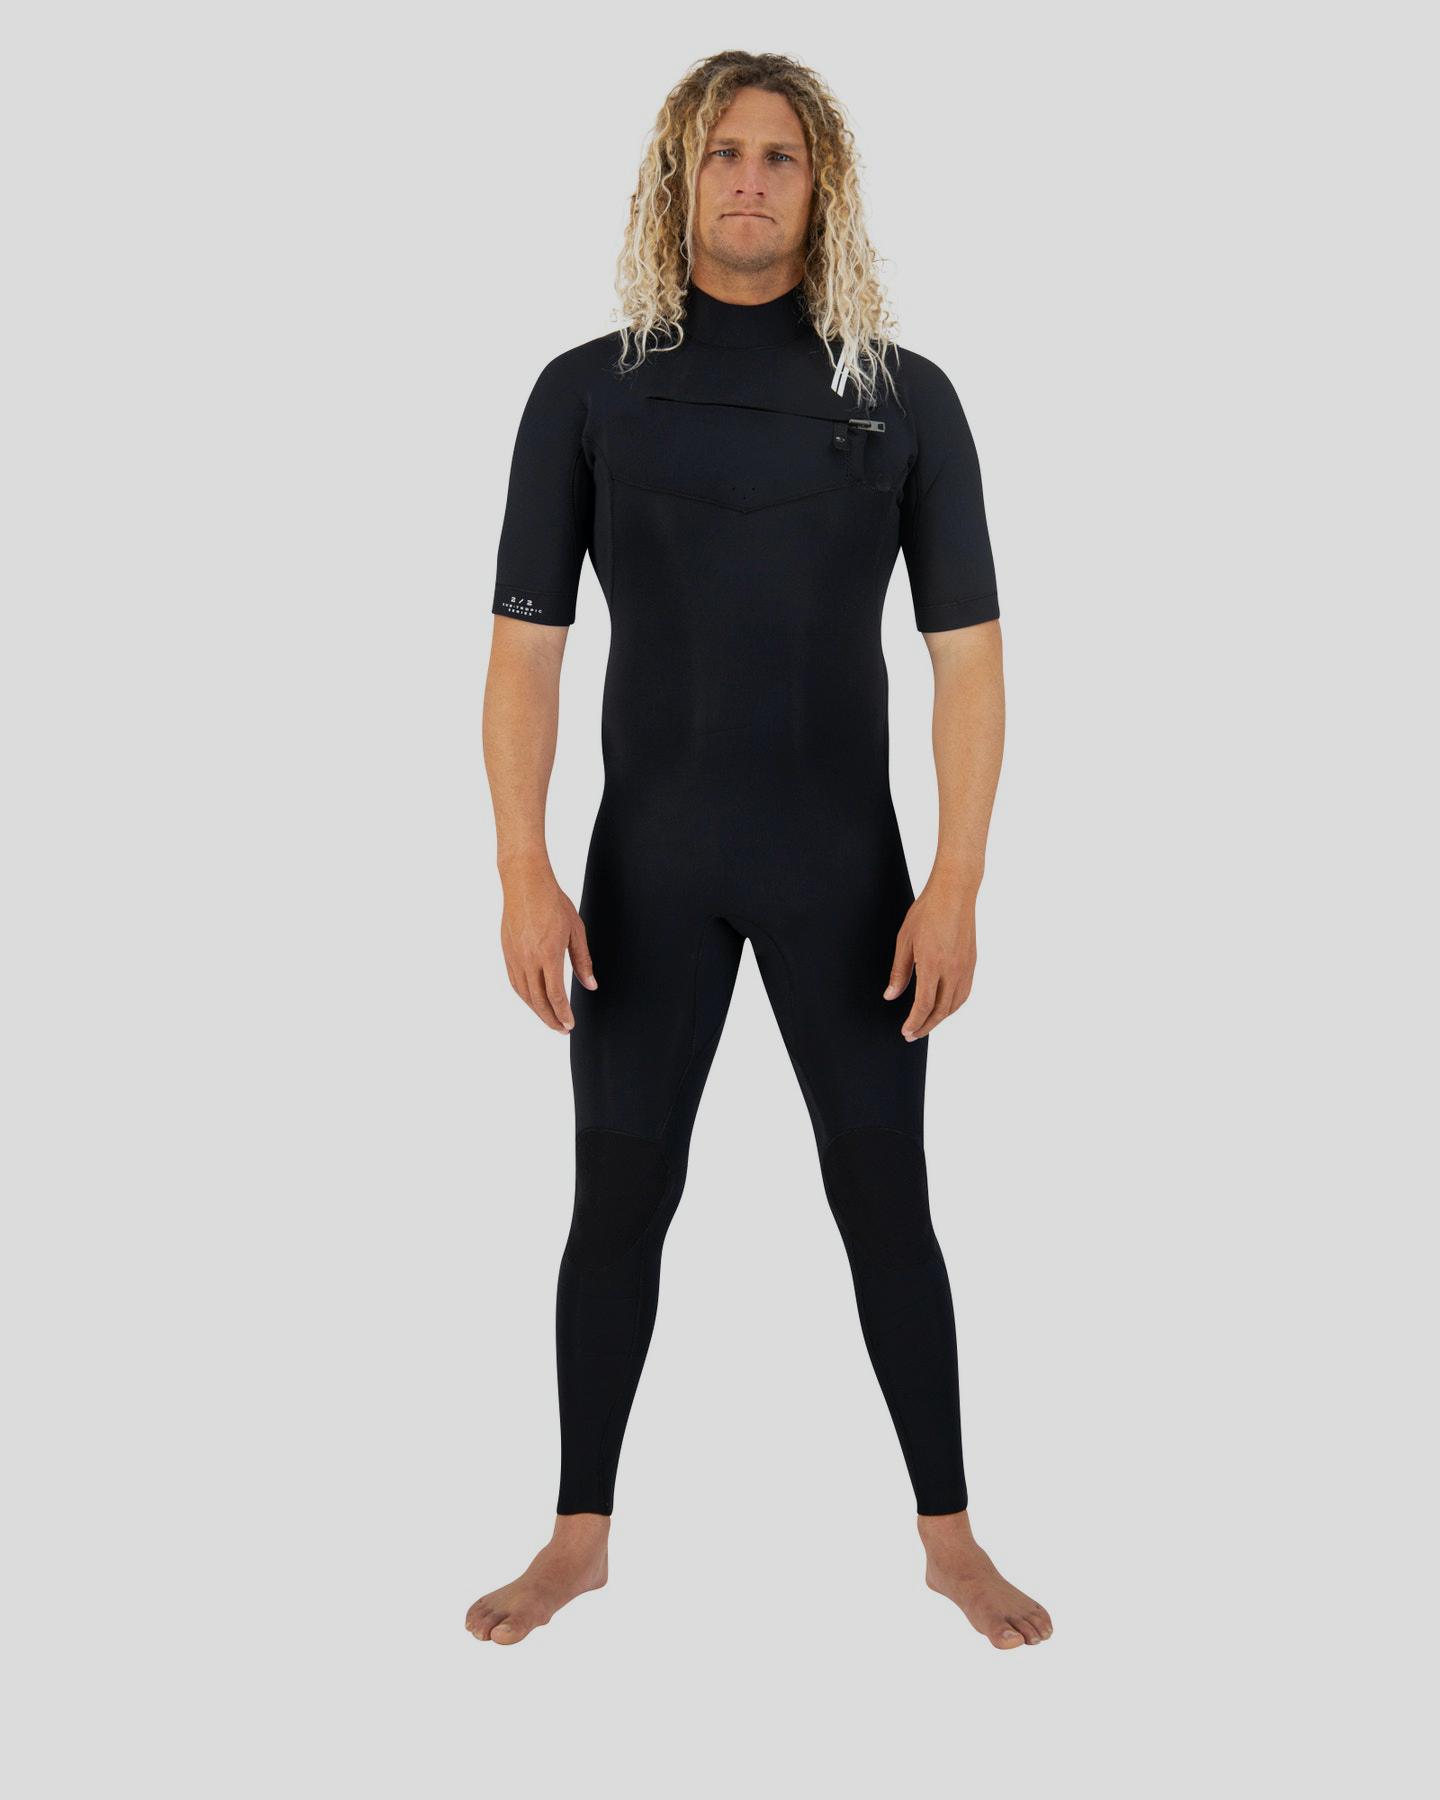 Coastlines Premium Mens 2/2 Short Sleeve Chest Zip Steamer Black